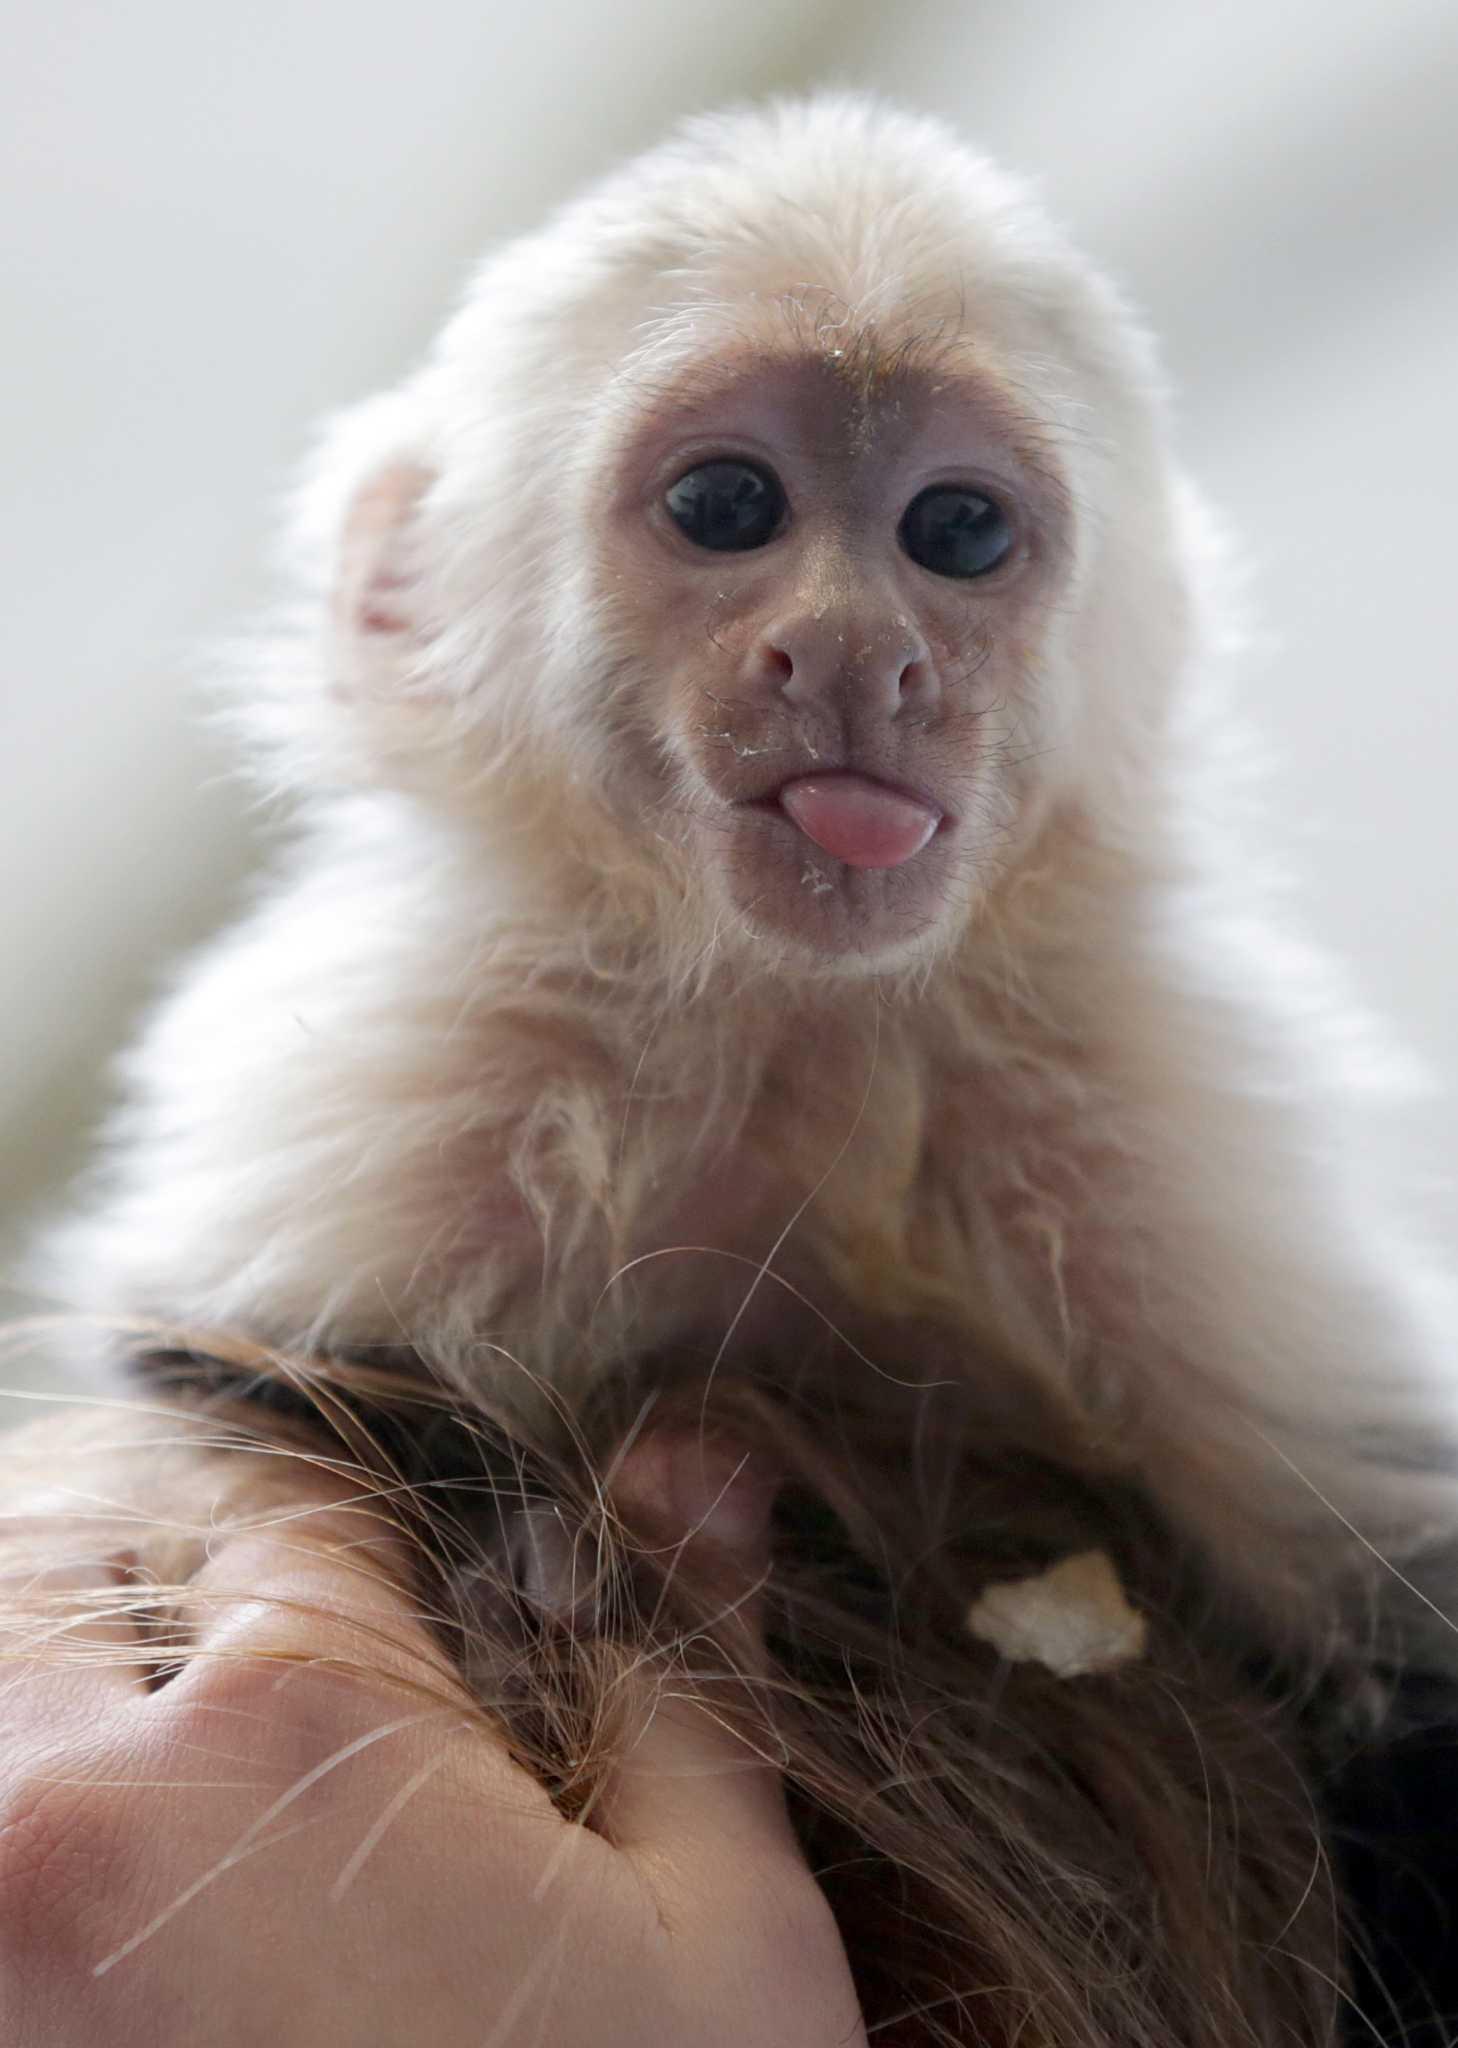 how to potty train a marmoset monkey